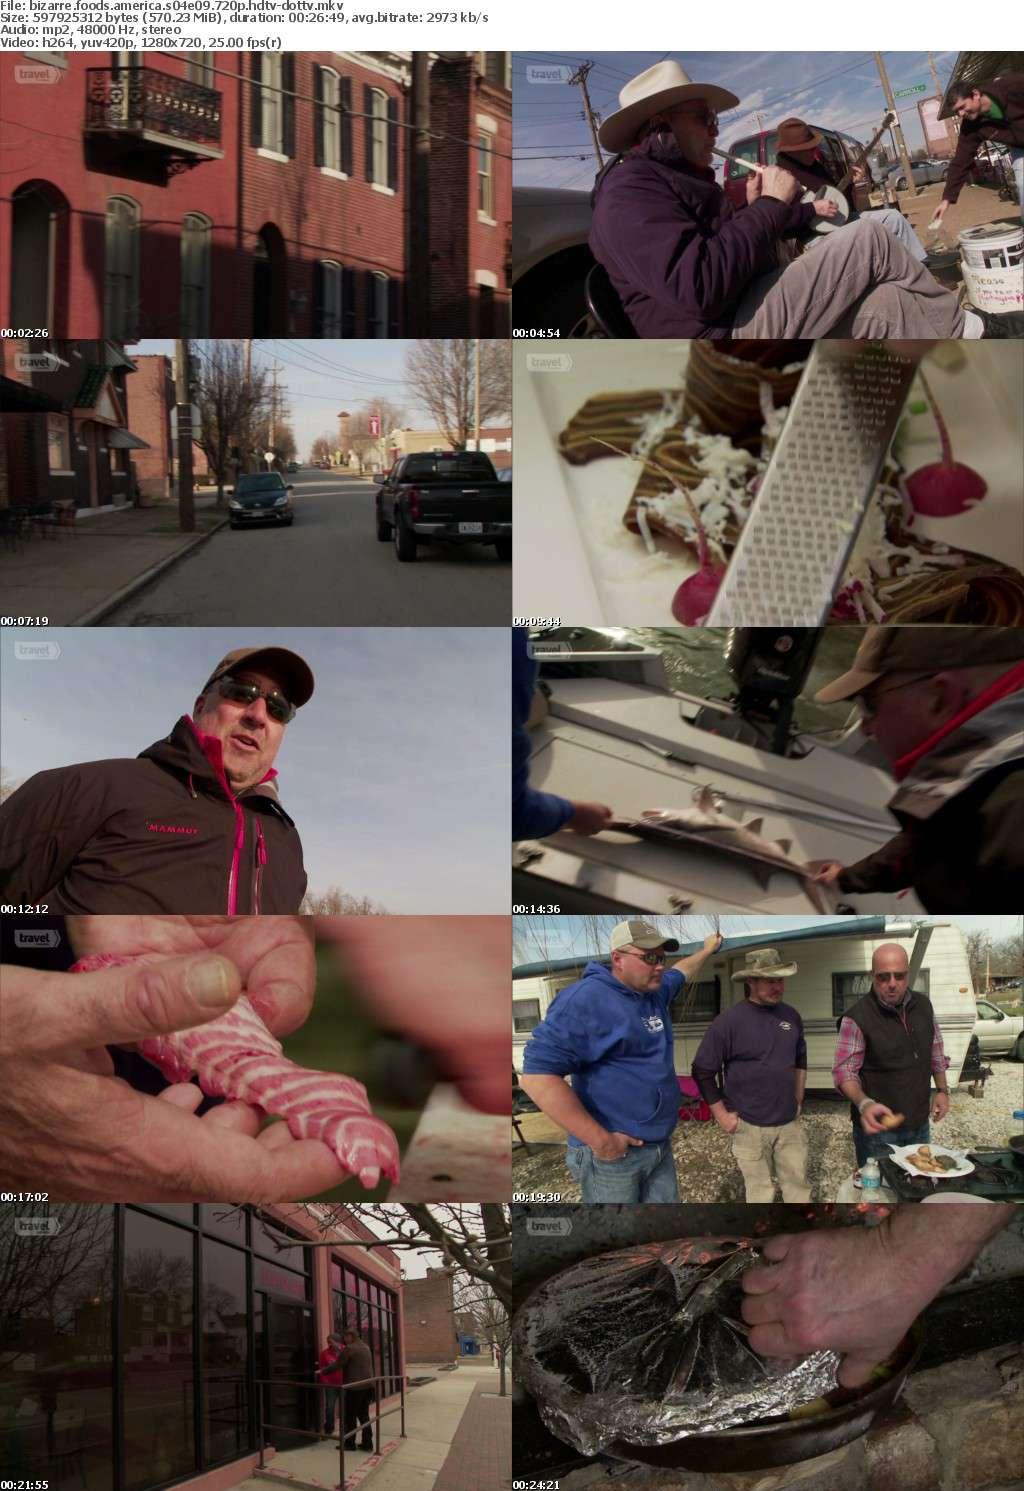 Bizarre Foods America S04E09 720p HDTV x264-dotTV